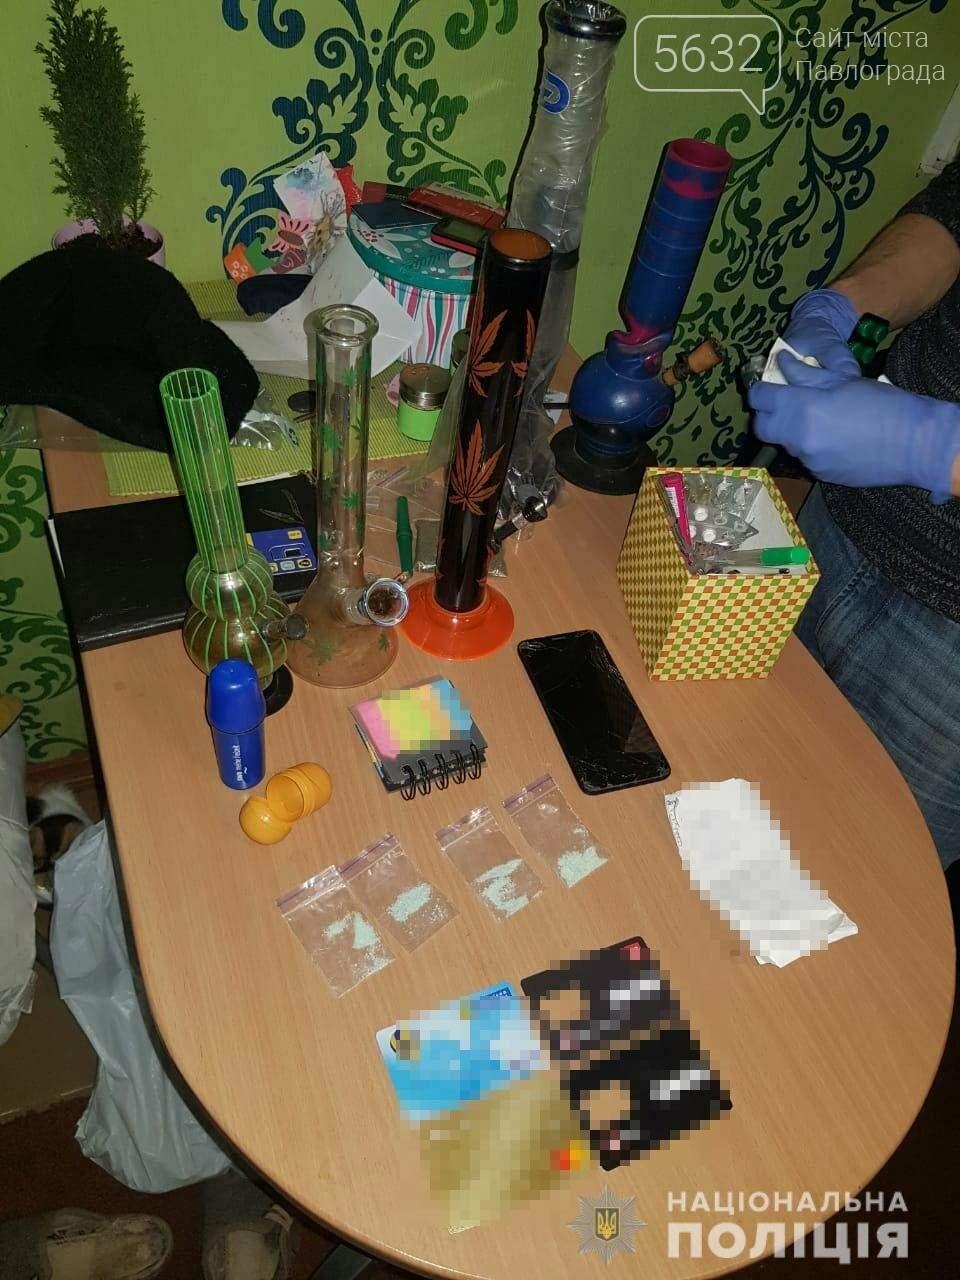 В Павлограде задержали наркосбытчика (ФОТО, ВИДЕО), фото-2